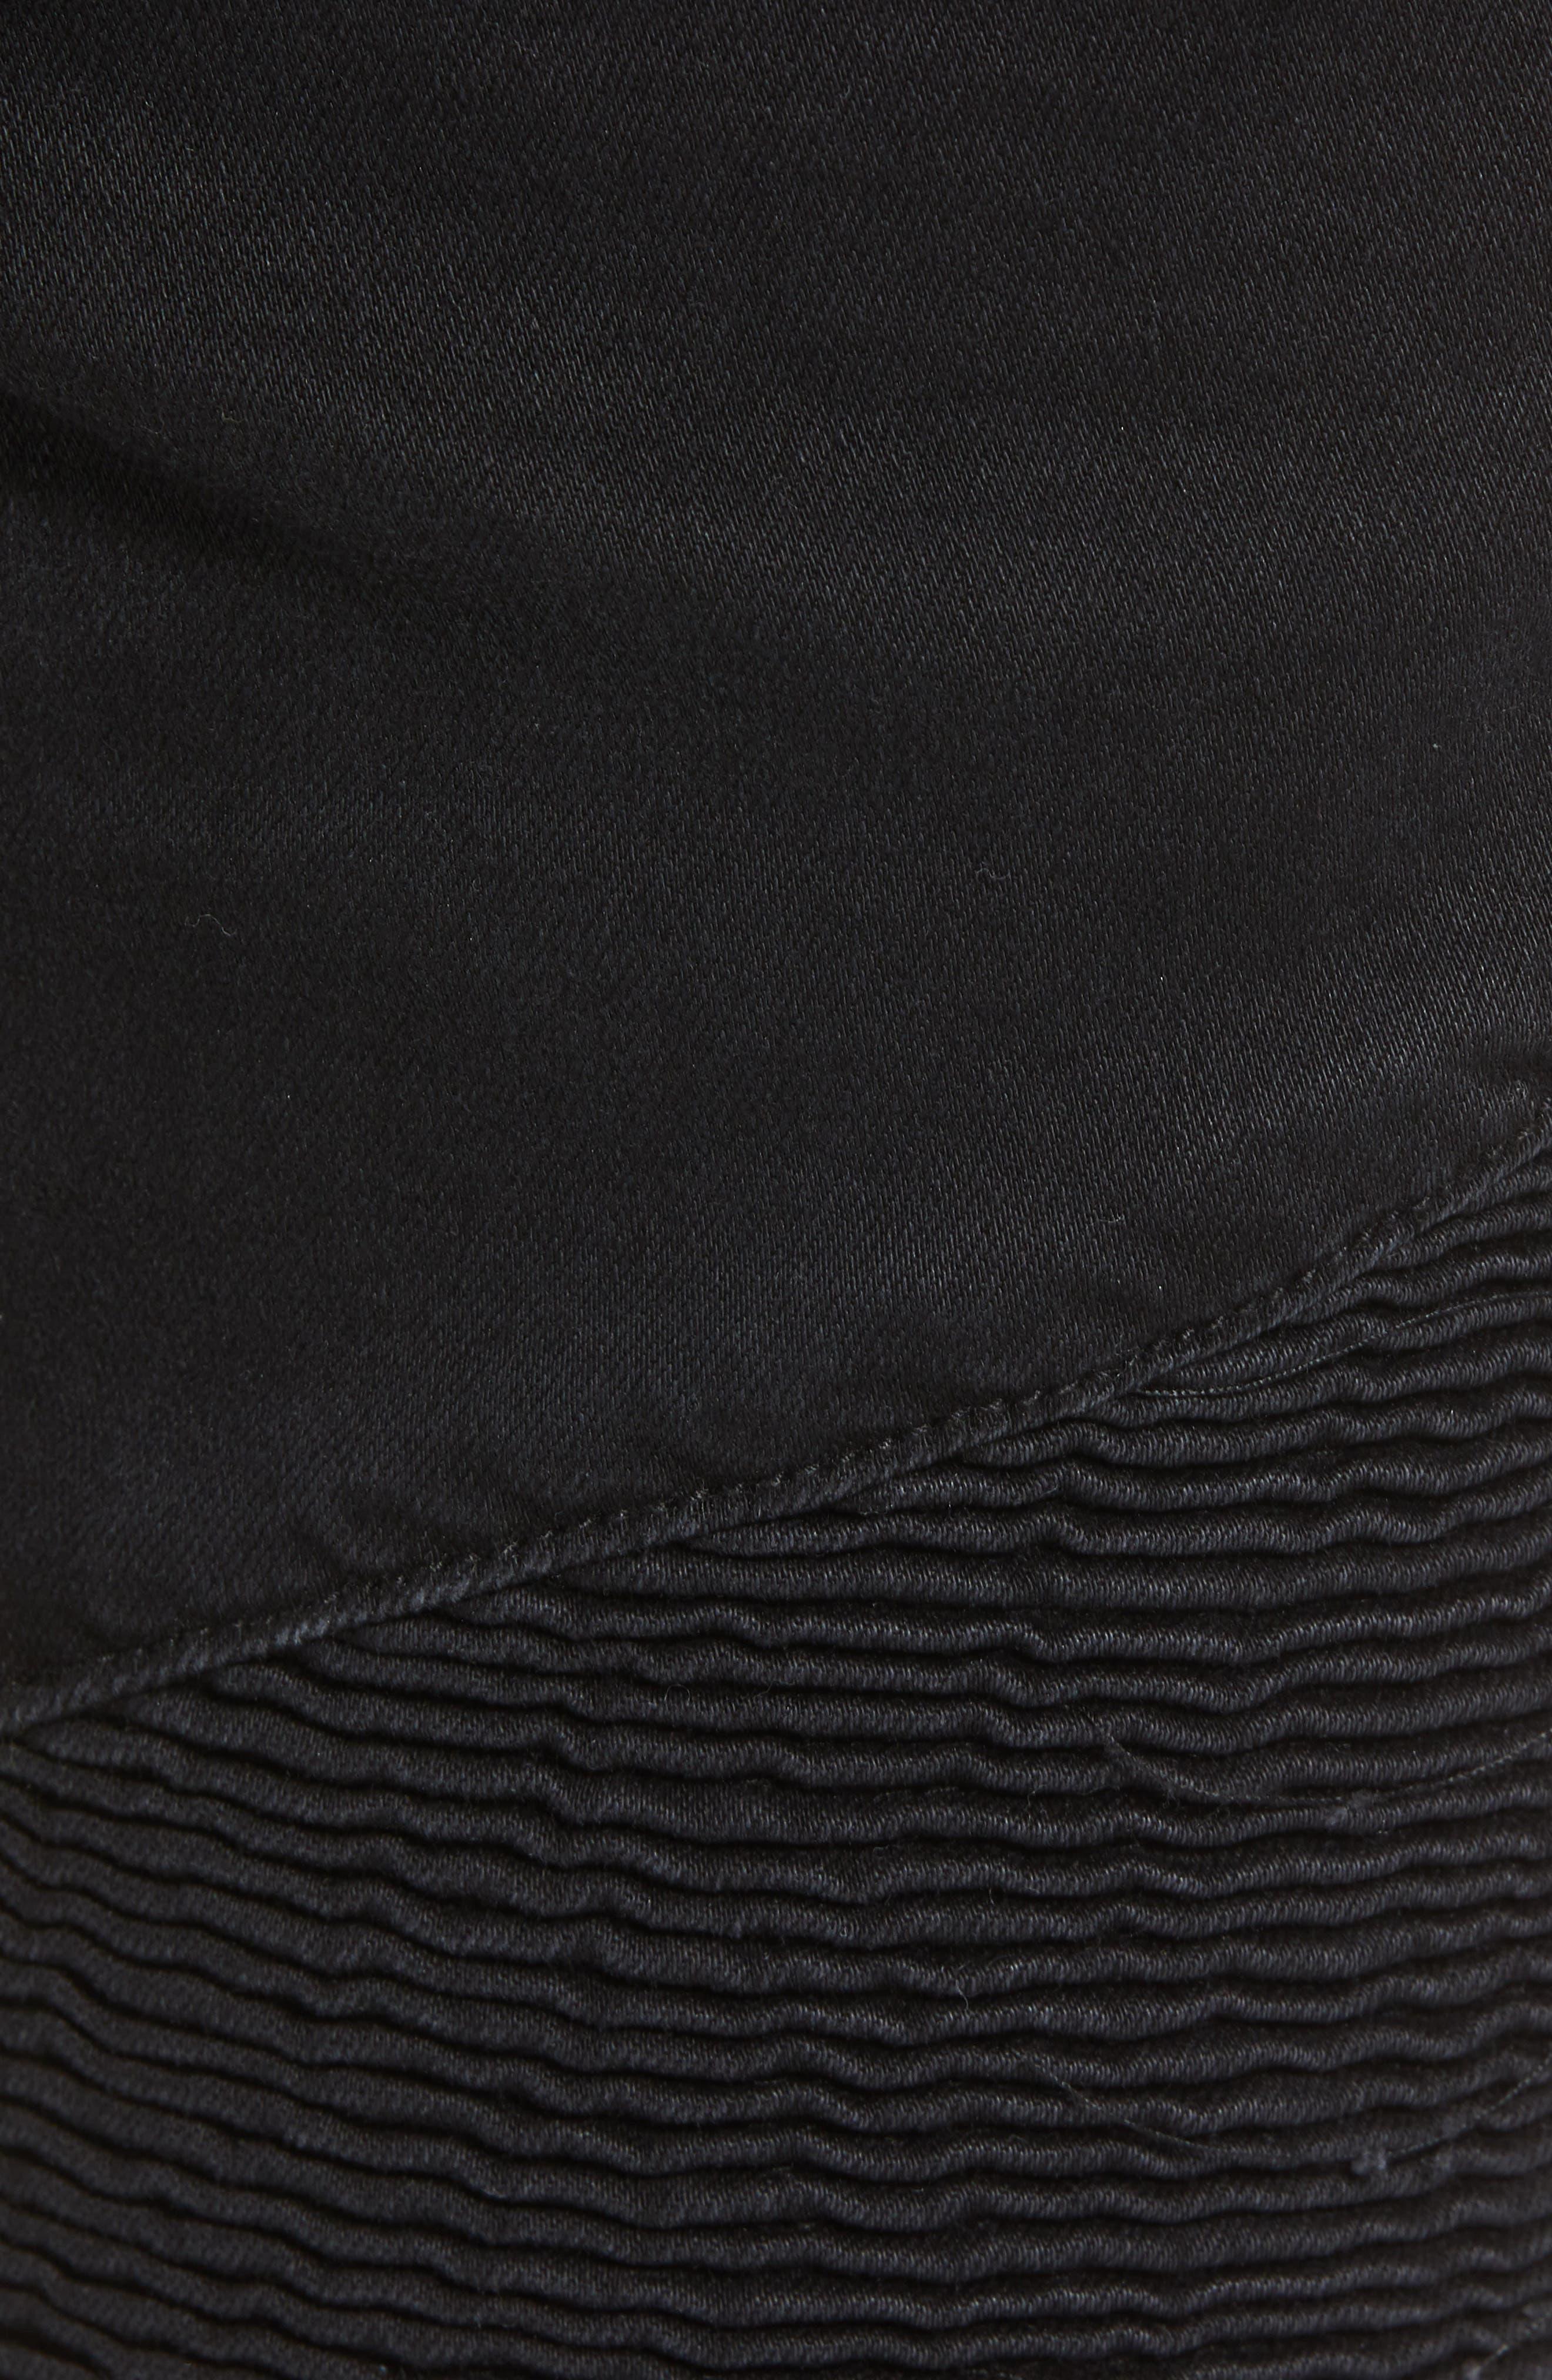 Combination Moto Skinny Moto Jeans,                             Alternate thumbnail 5, color,                             BLACK